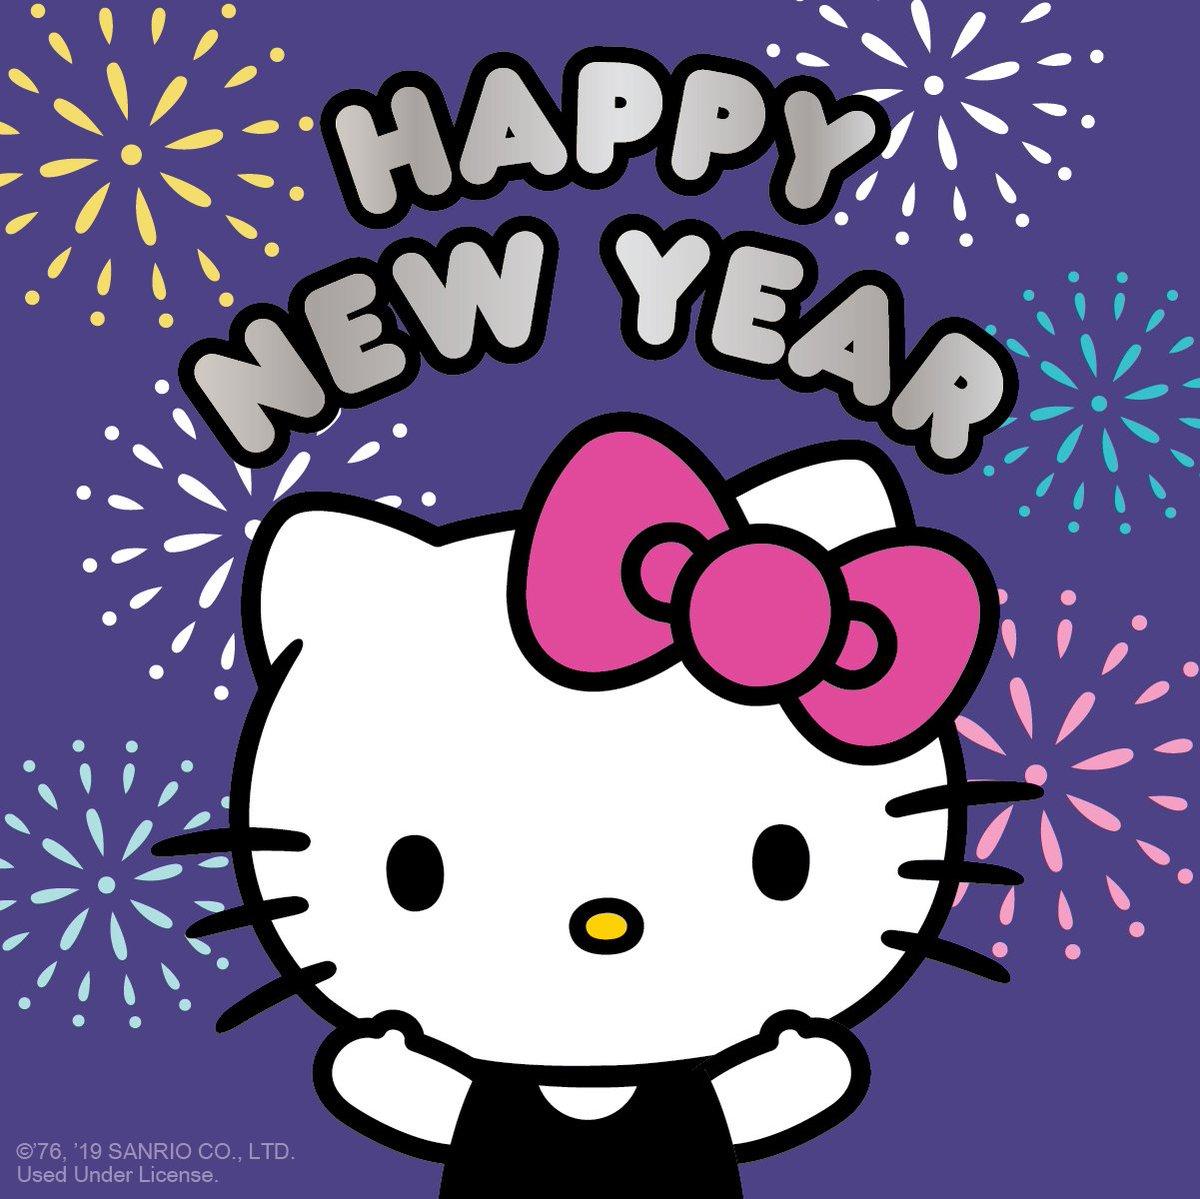 659ba8b680e6 Hello Kitty Cafe on Twitter